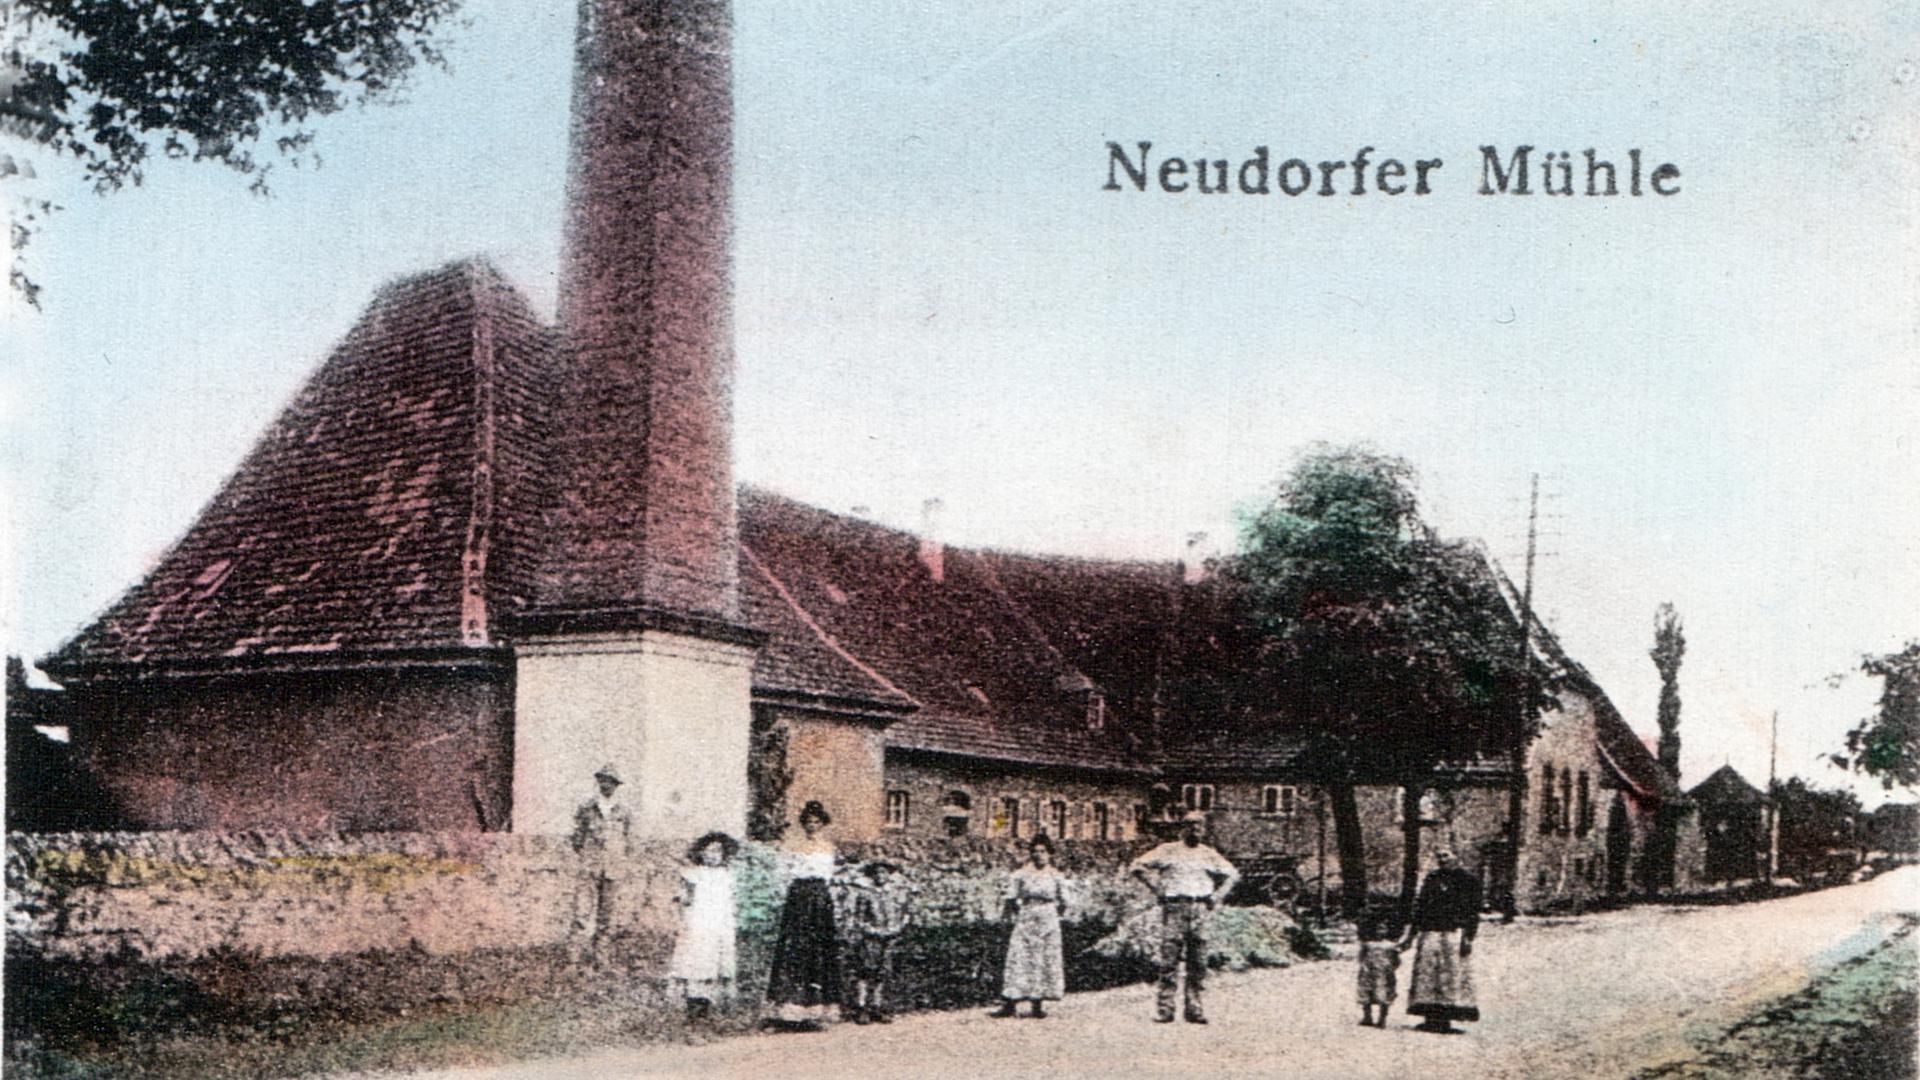 Neudorfer Mühle